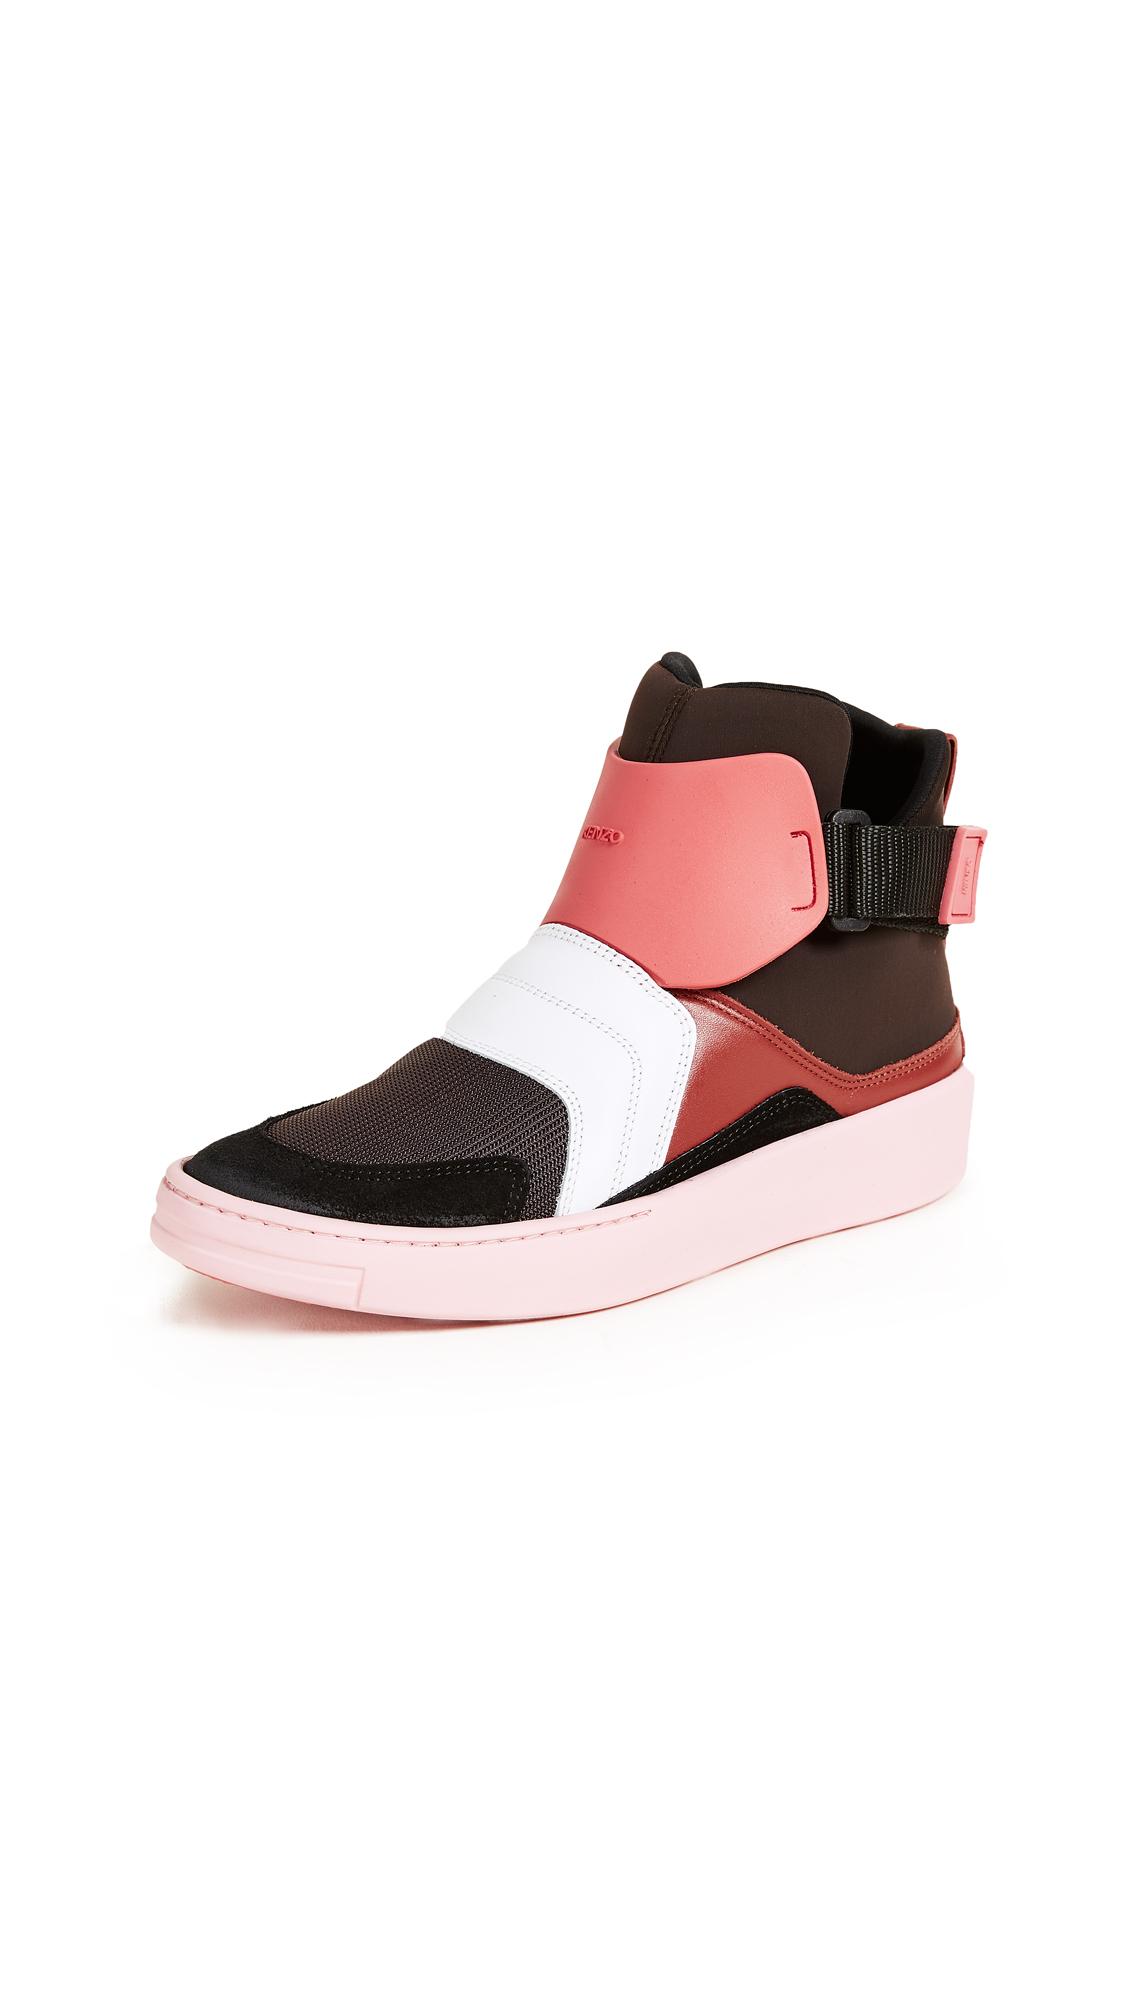 KENZO K-Block Sneakers - Coral